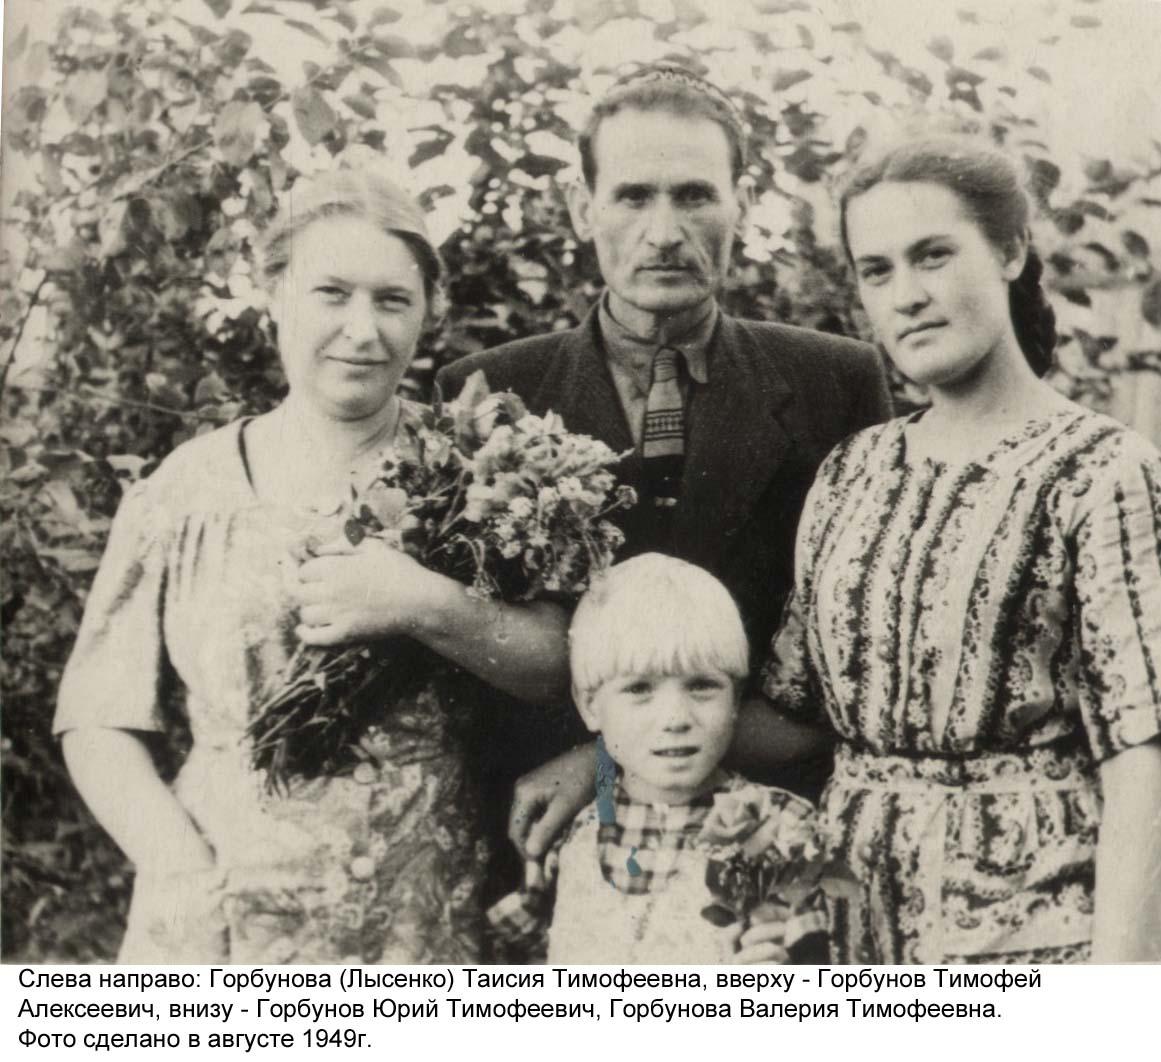 Слева — Горбунова (Лысенко) Таисия Тимофеевна, вверху — Горбунов Тимофей Алексеевич, внизу — Горбунов Юрий Тимофеевич, справа — Горбунова Валерия Тимофеевна. Фото сделано в августе 1949 г.